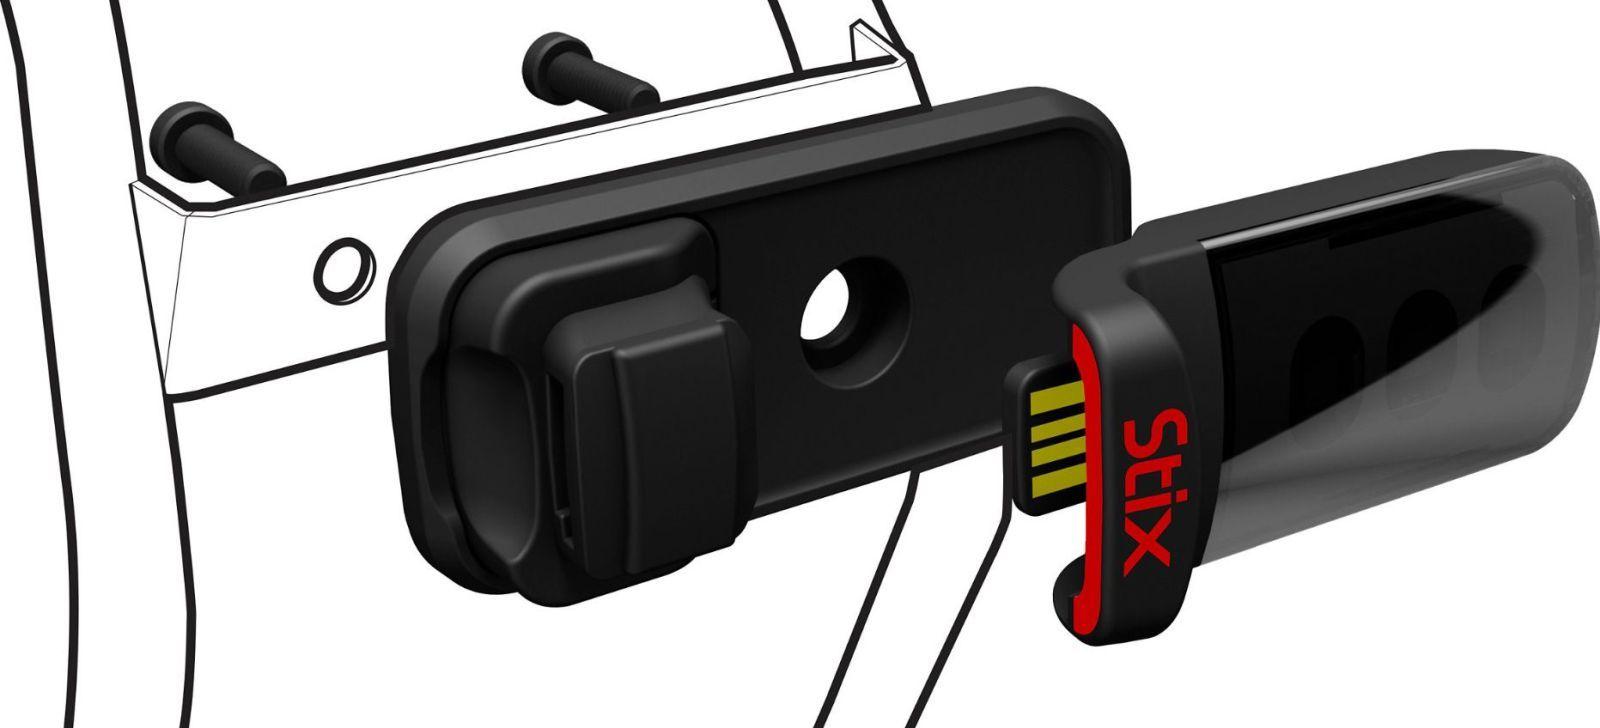 Specialized Stix Reflector Mount - black uni